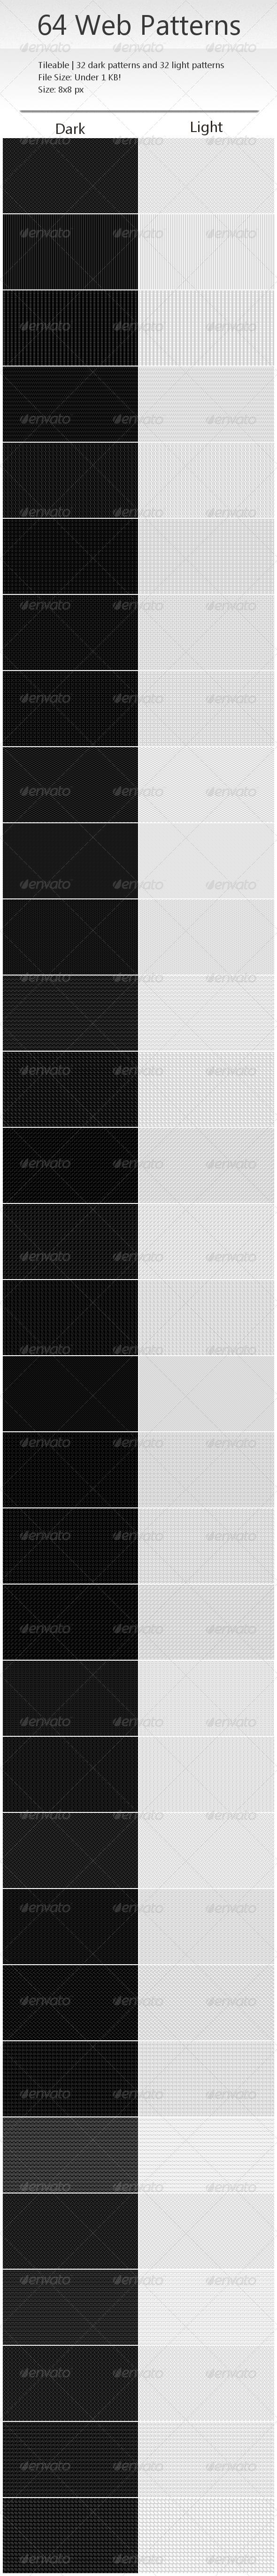 64 Tileable Pixel Web Patterns - Patterns Backgrounds